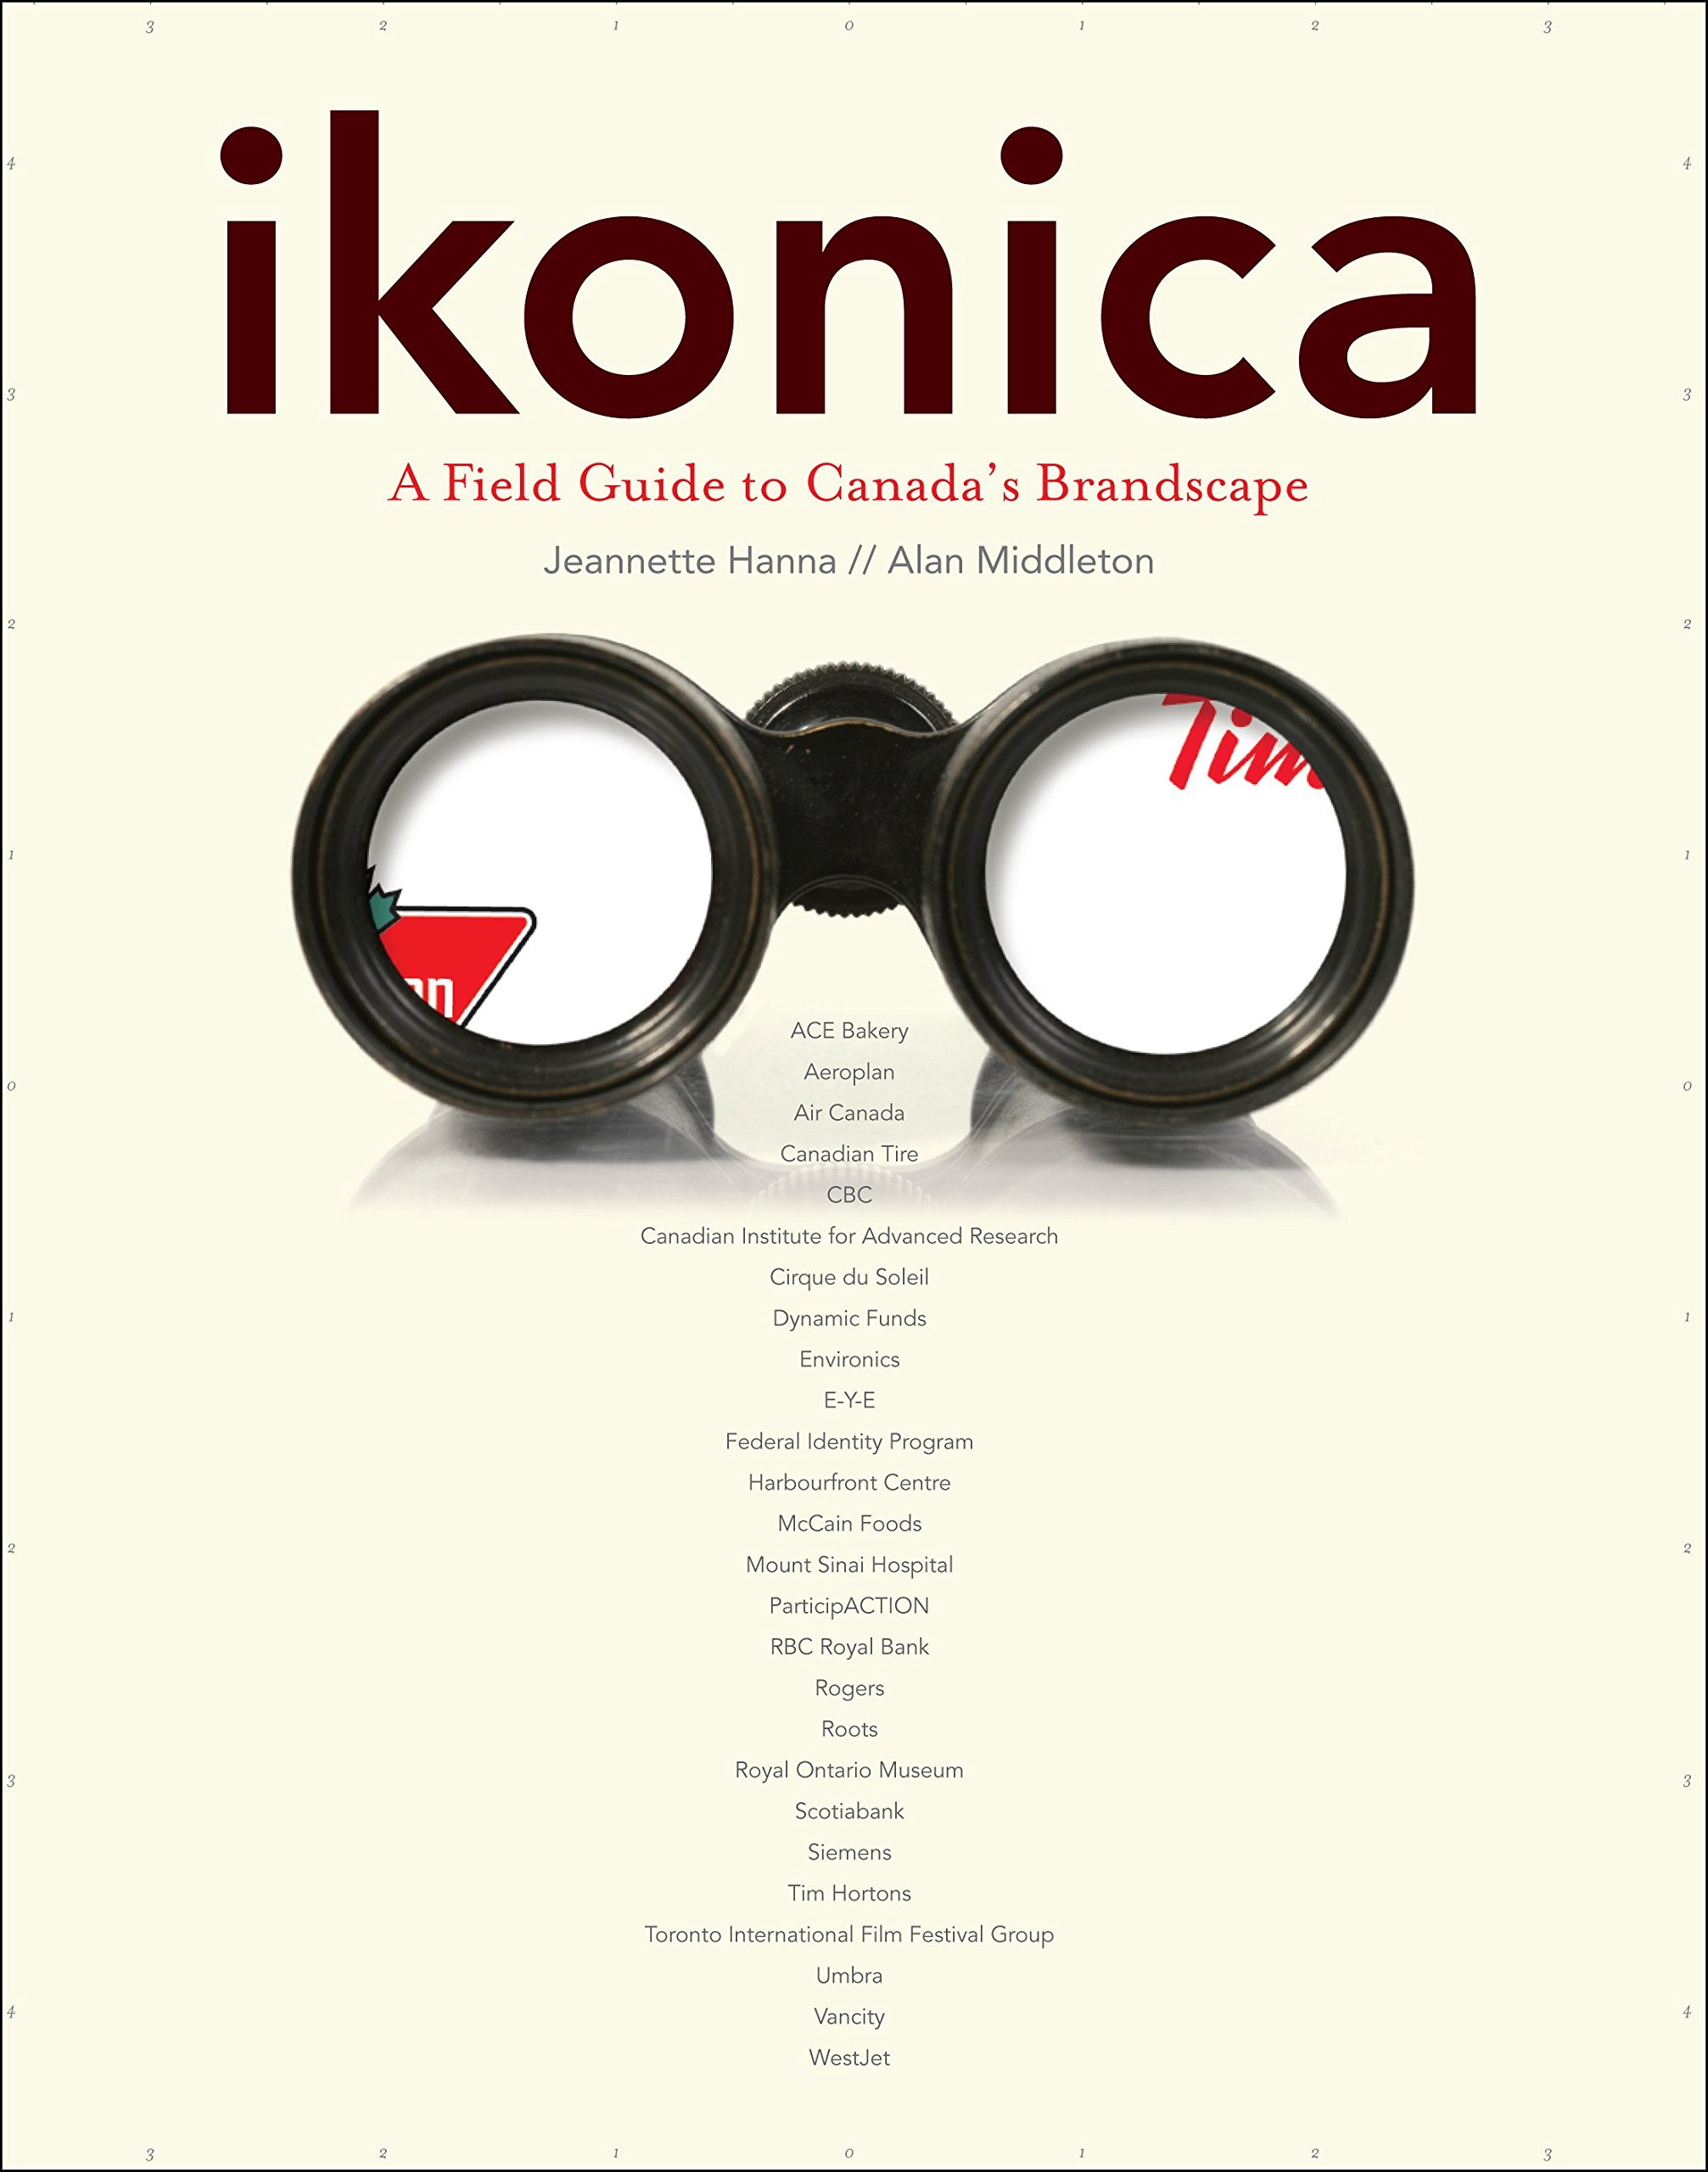 ikonica: A Field Guide to Canada\'s Brandscape: Amazon.es: Jeanette ...